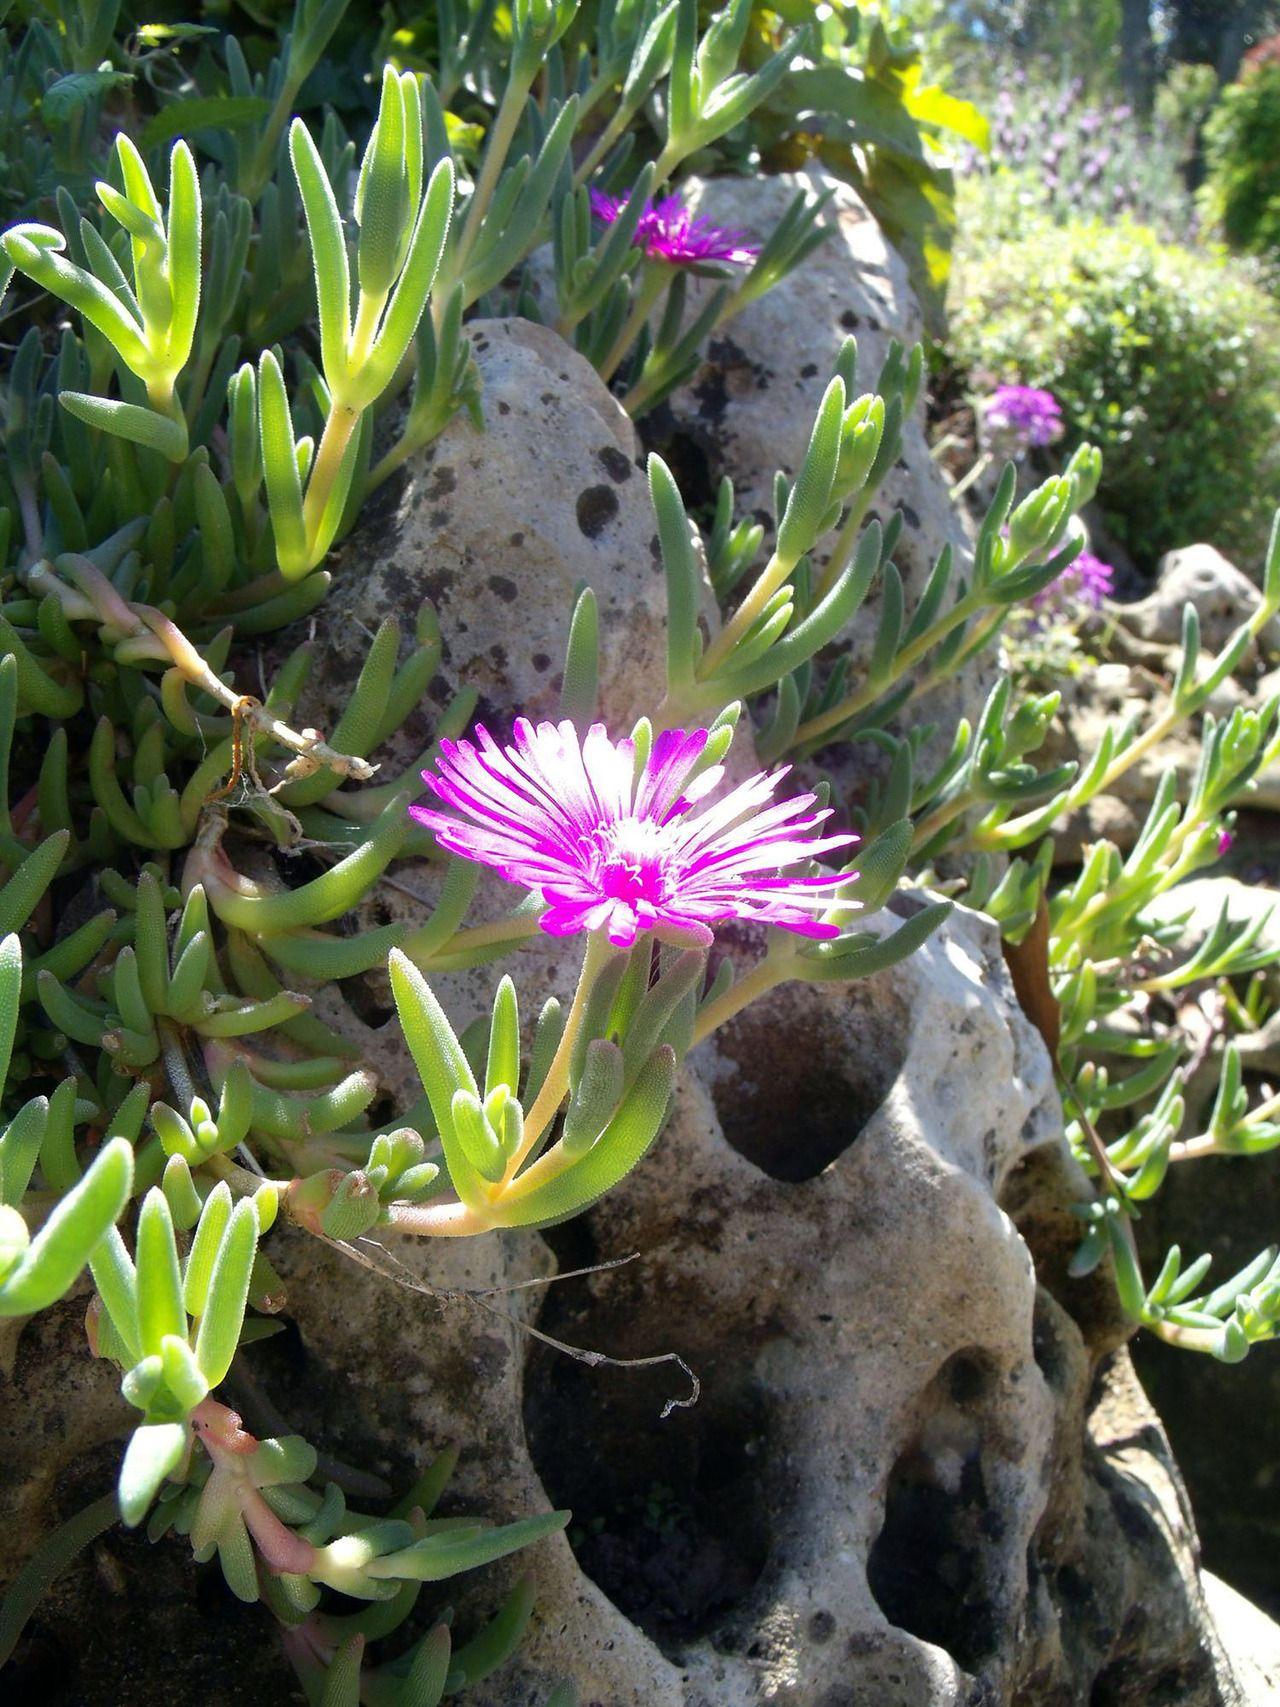 Purple Flower Dallas Arboretum and Botanical Gardens